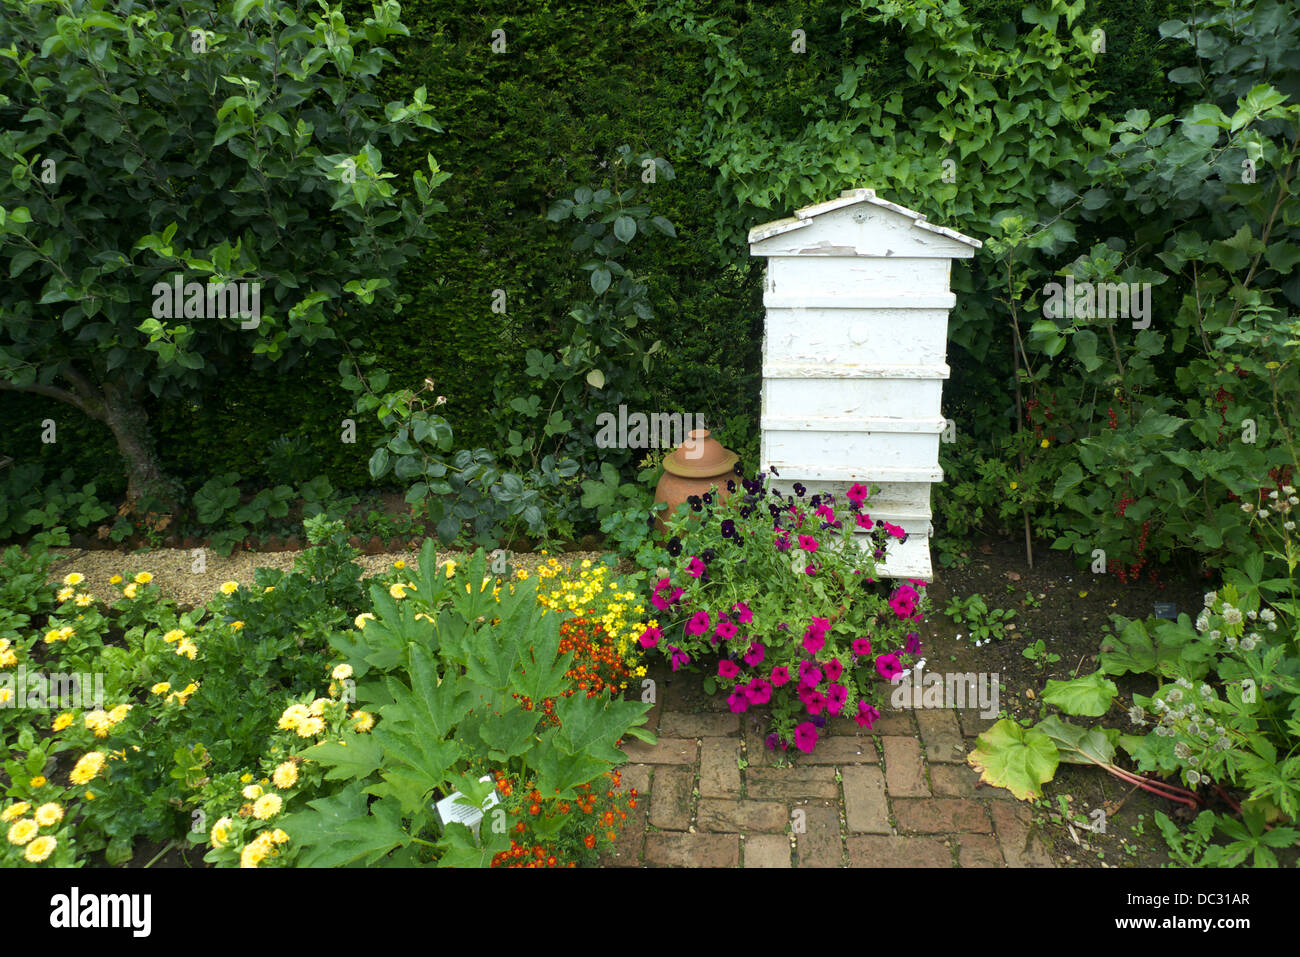 A corner of an organic kitchen cottage garden, UK. - Stock Image